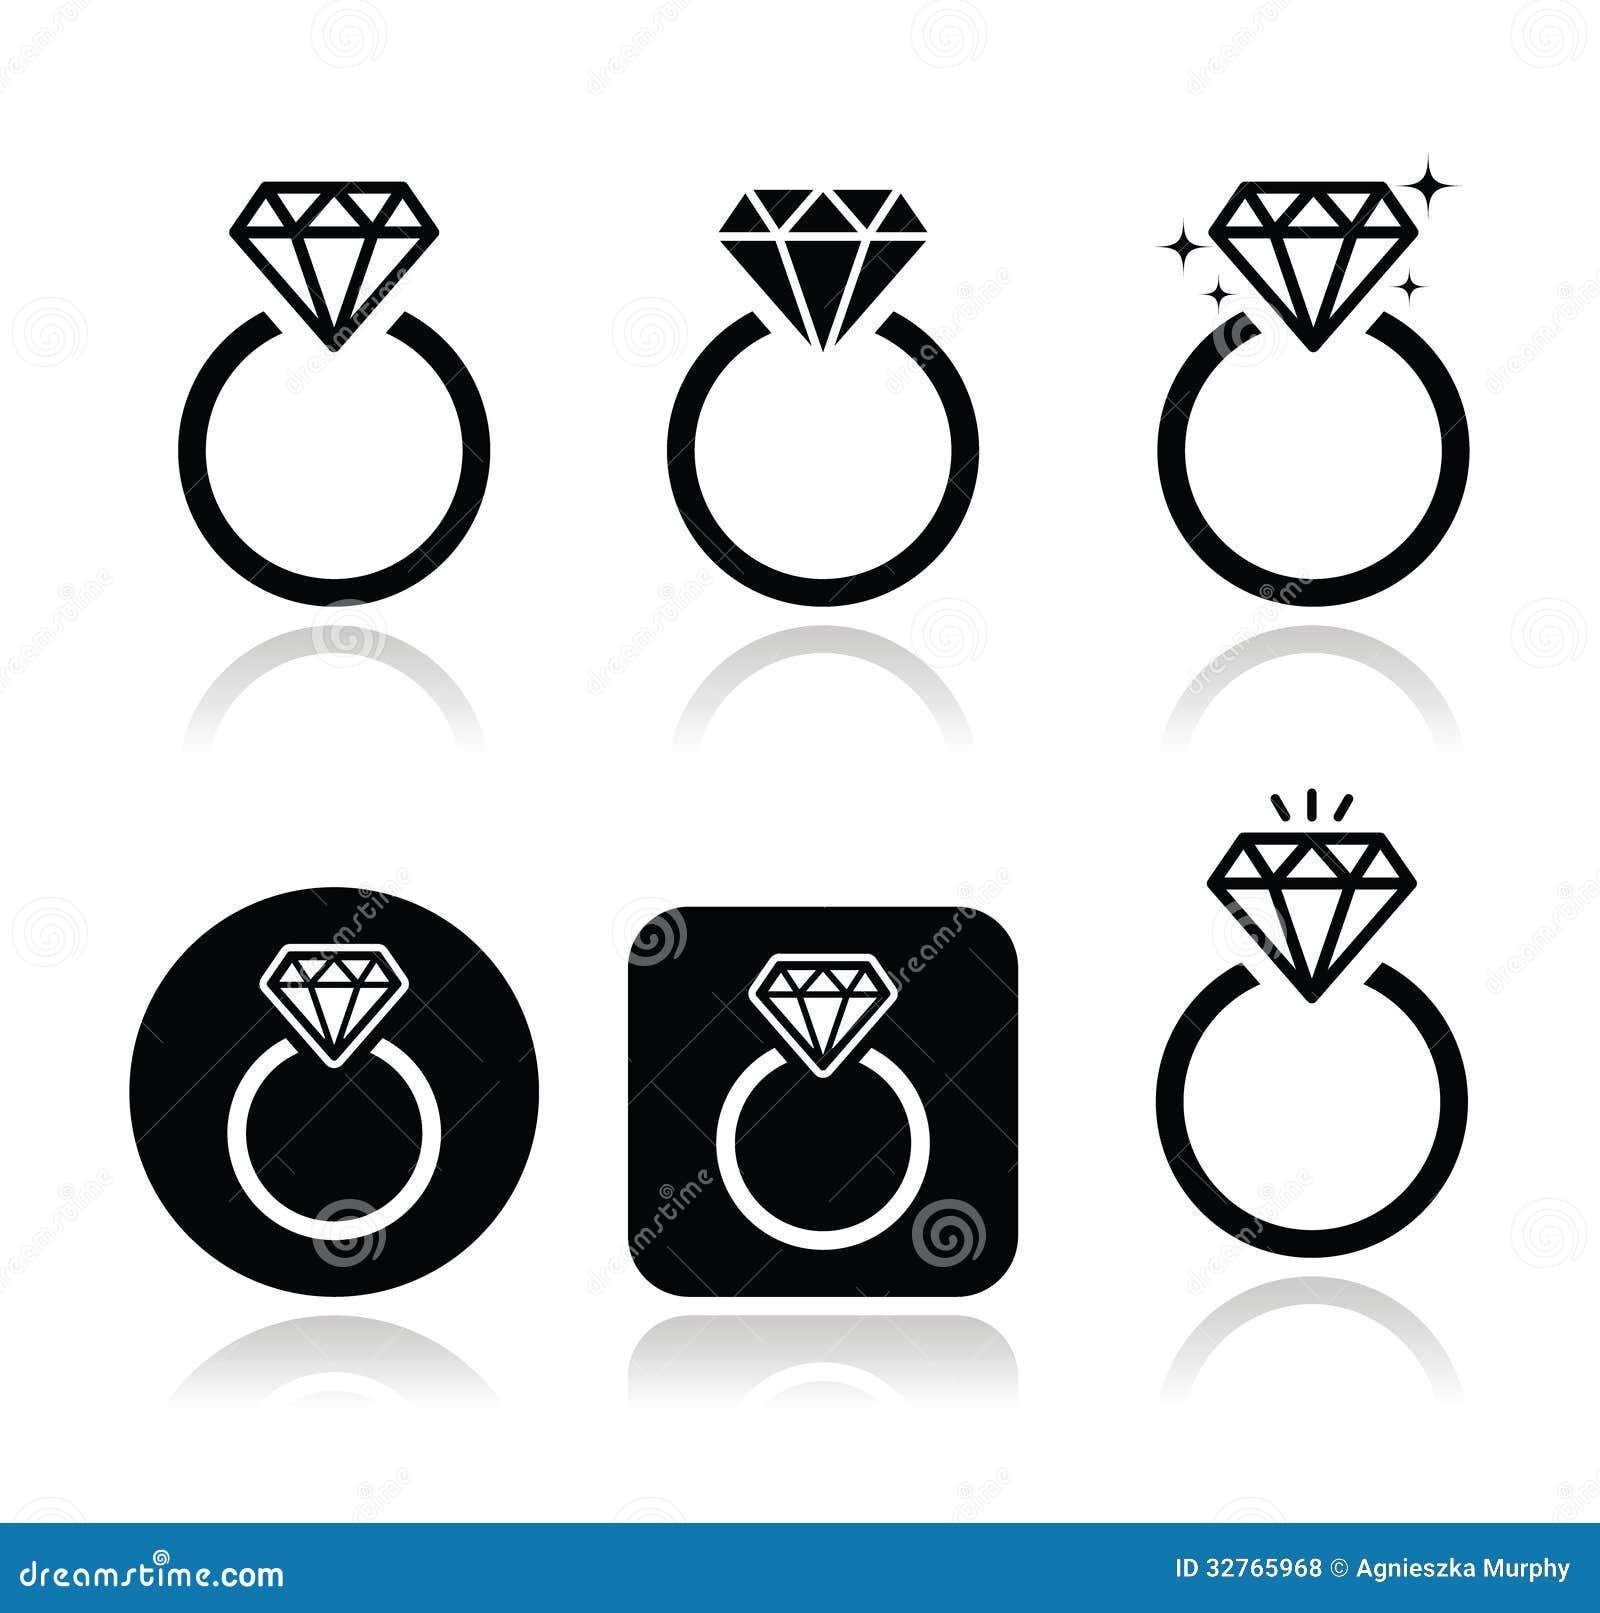 Diamond Engagement Ring Icon Royalty Free Stock Photos - Image ...